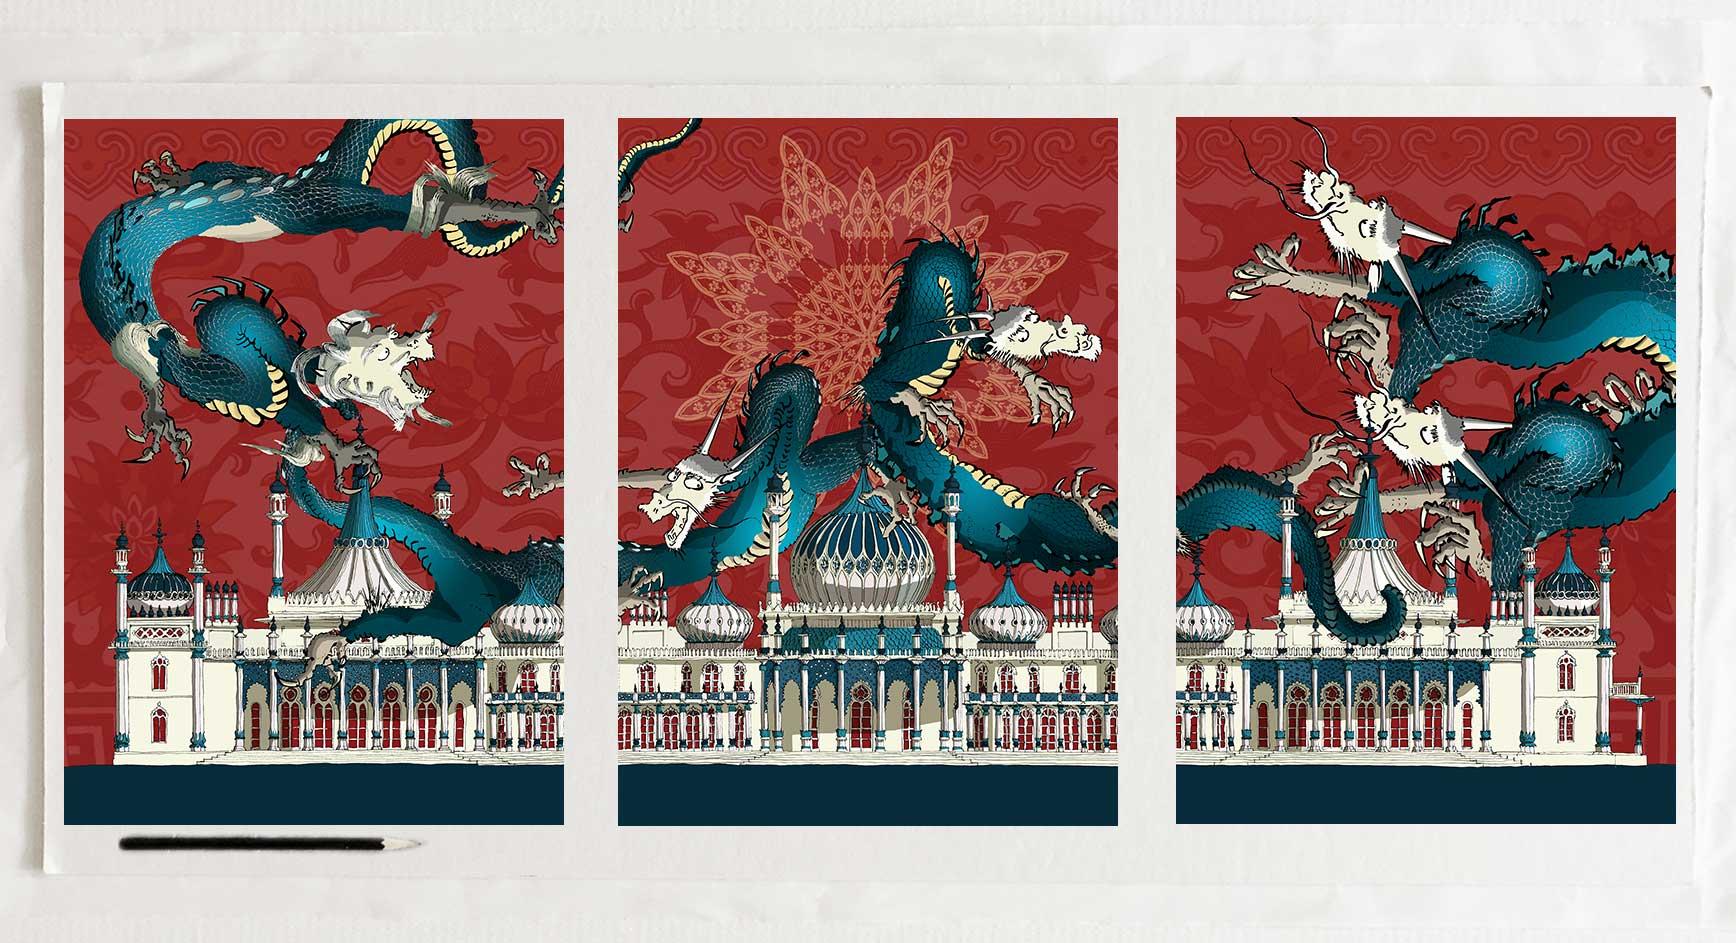 Art print by artist alej ez titled Dragon artwork Brighton Pavilion Crimson and Blue Samson Triptych